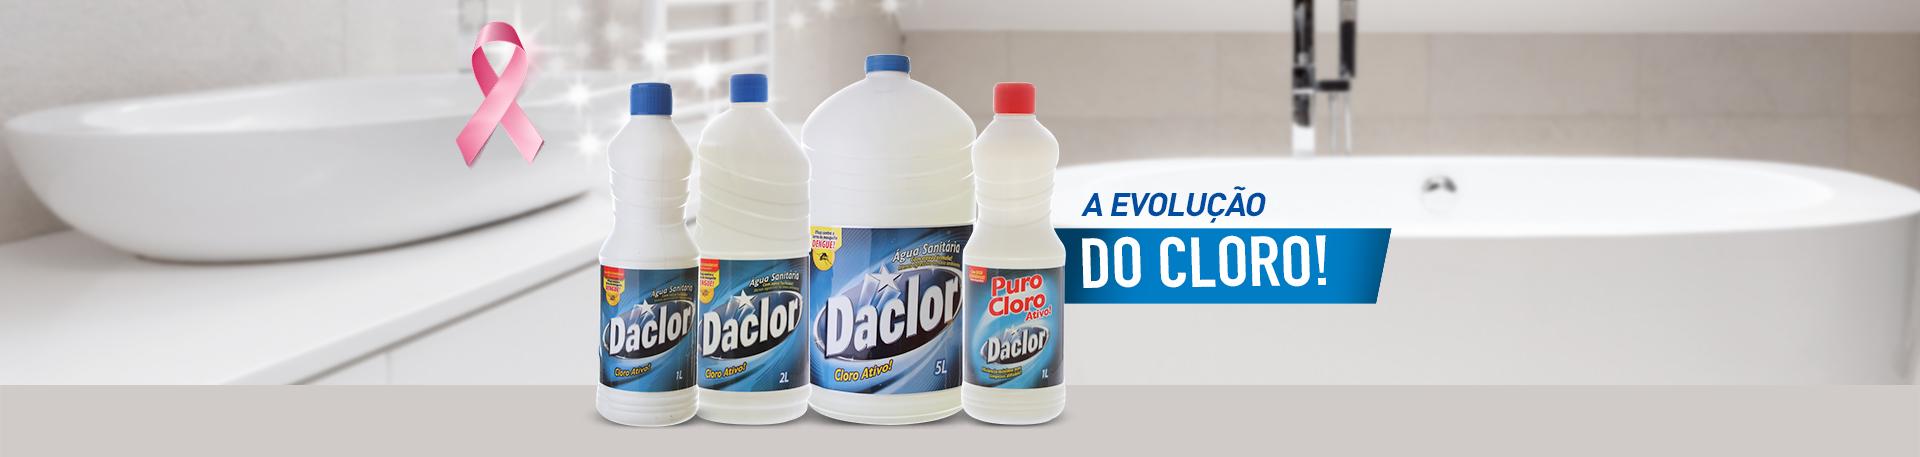 Daclor